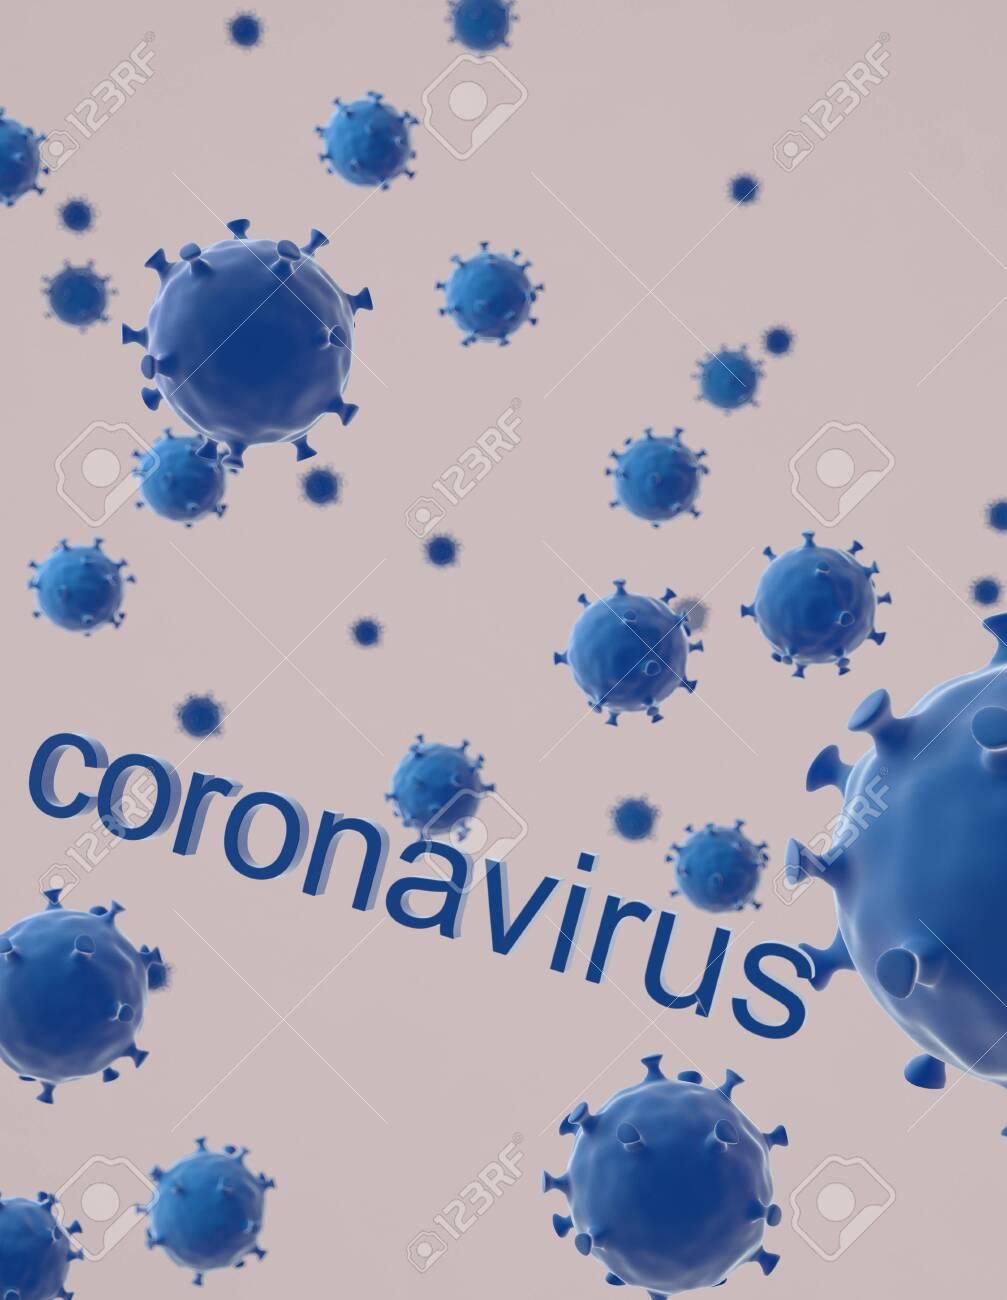 The coronavirus on white baground,3d render. - 140757807